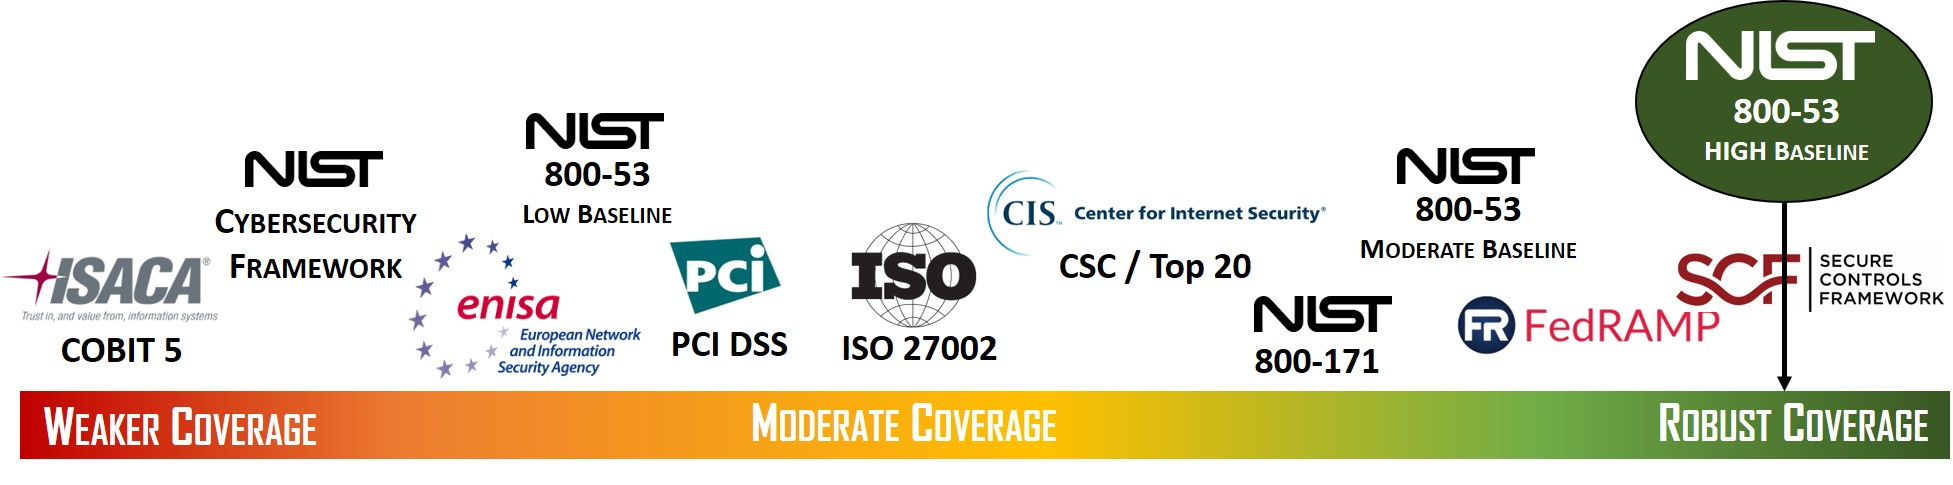 2020-spectrum-nist-800-54-low-moderate-high-baseline-compliance.jpg